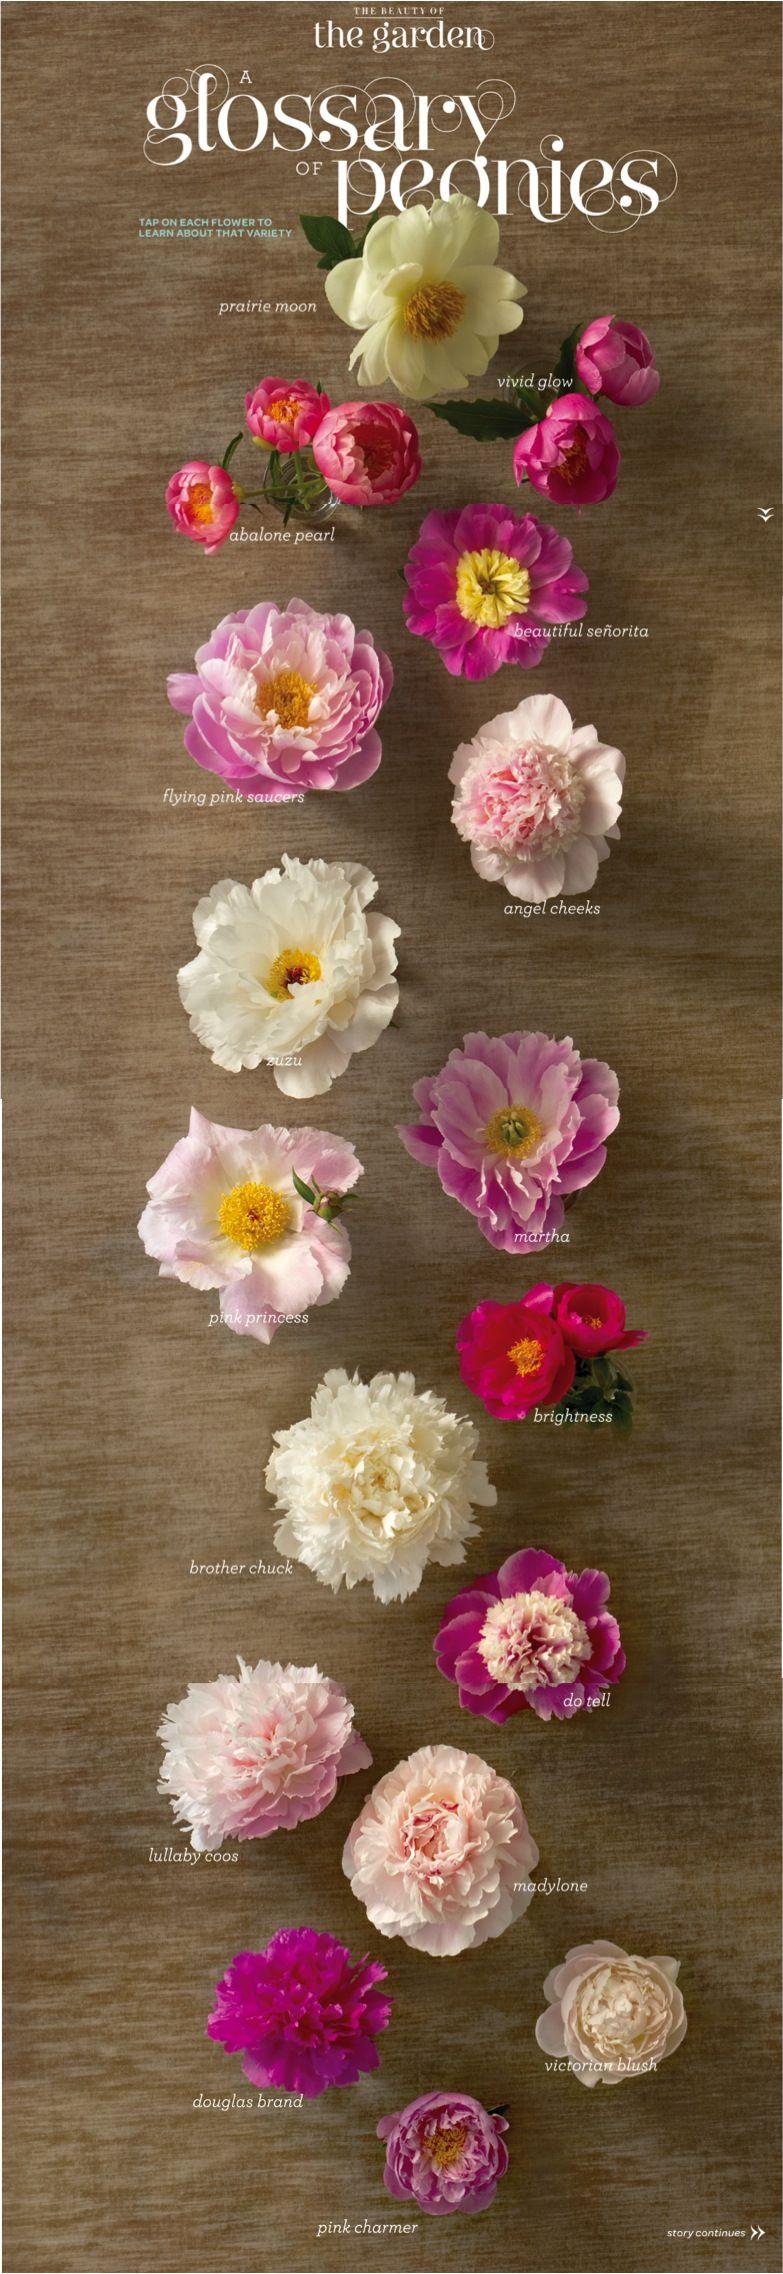 Peonies 101 | Flowers | Pinterest | Peony, Flowers and Gardens